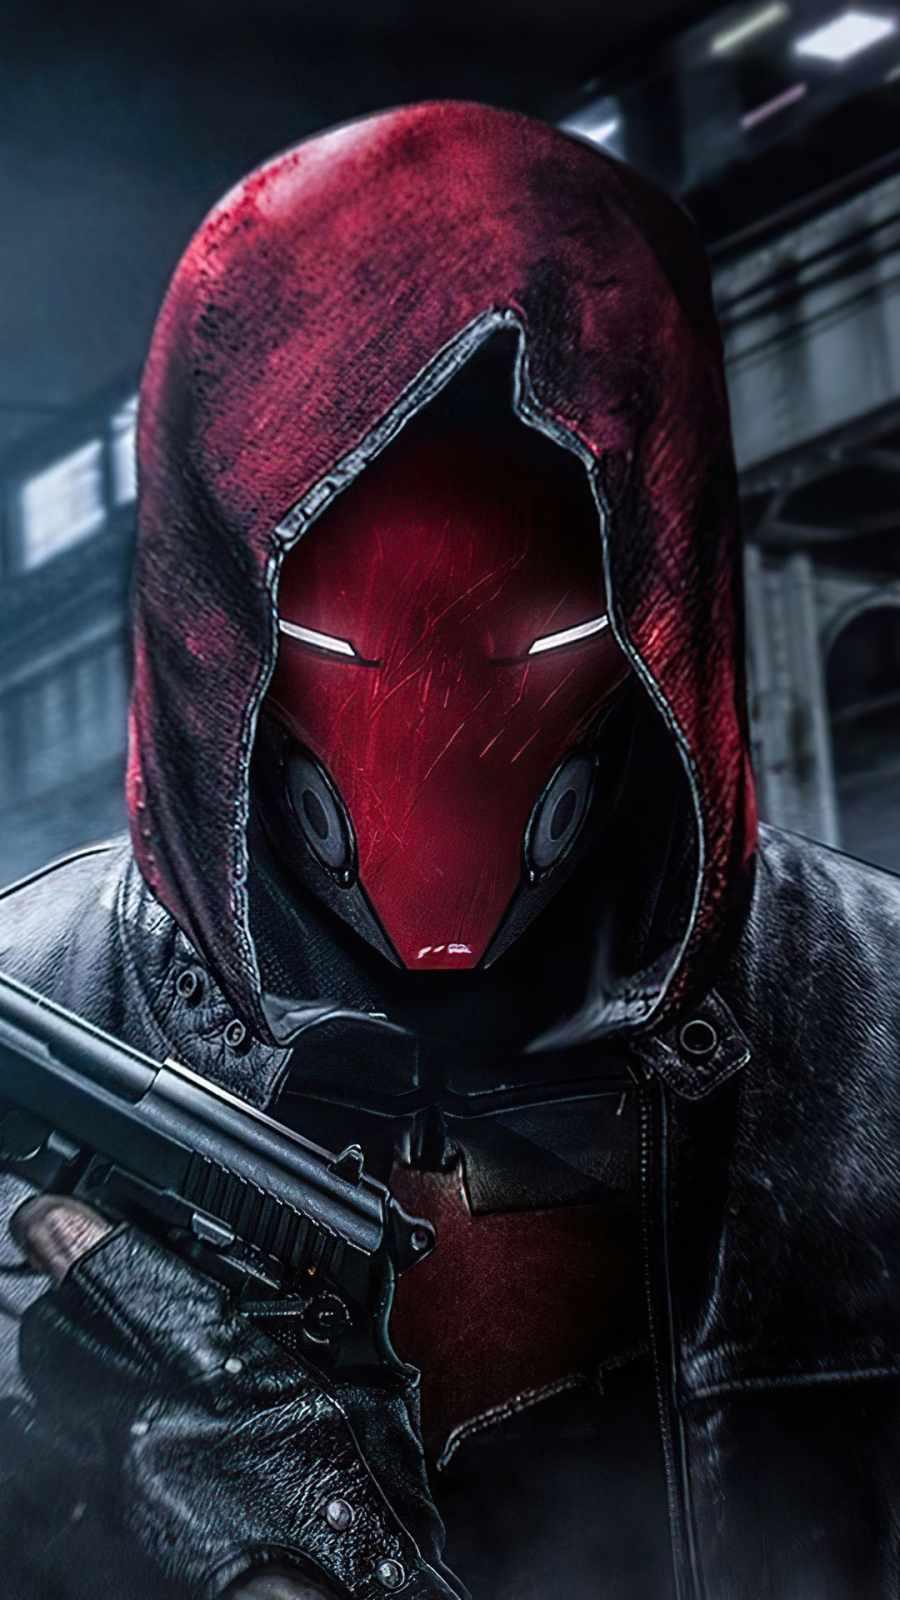 Red Hood with Gun iPhone Wallpaper